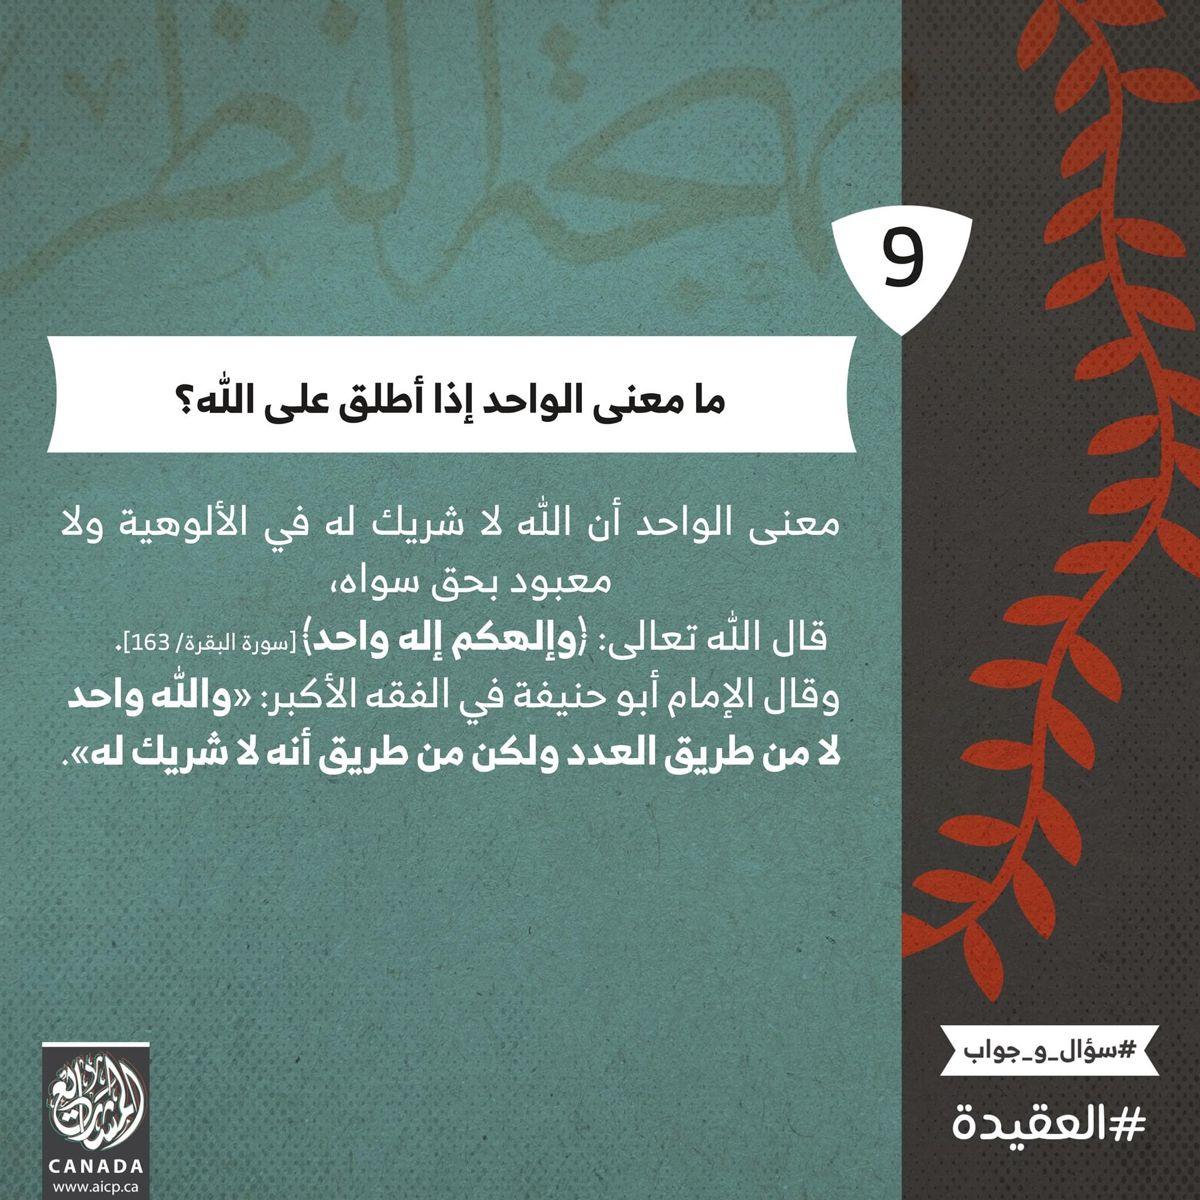 Pin By Alsunniy On معلومات إسلامية In 2021 Islam Pandora Screenshot Pandora